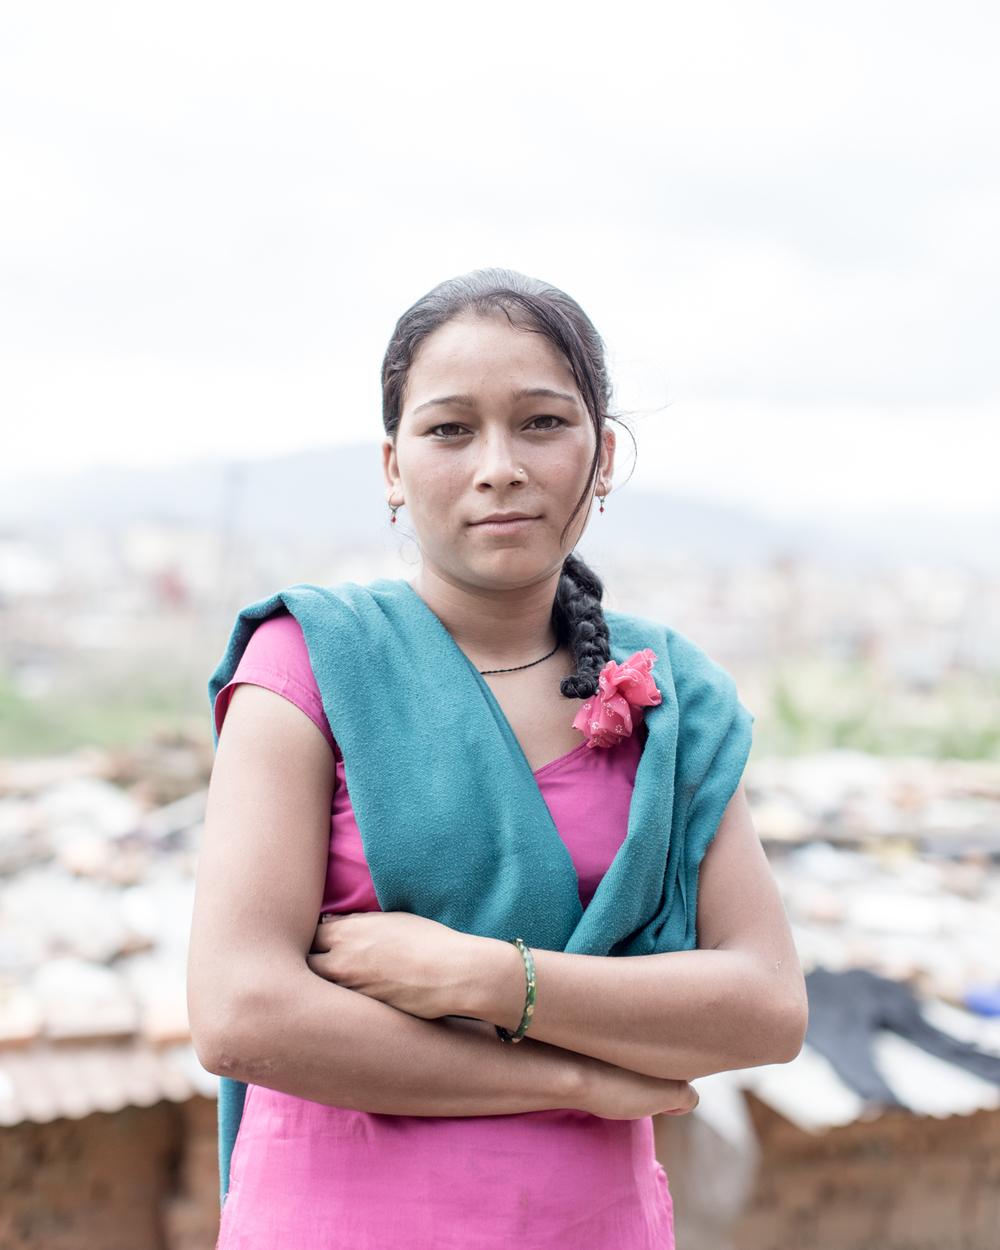 Patan, 2014